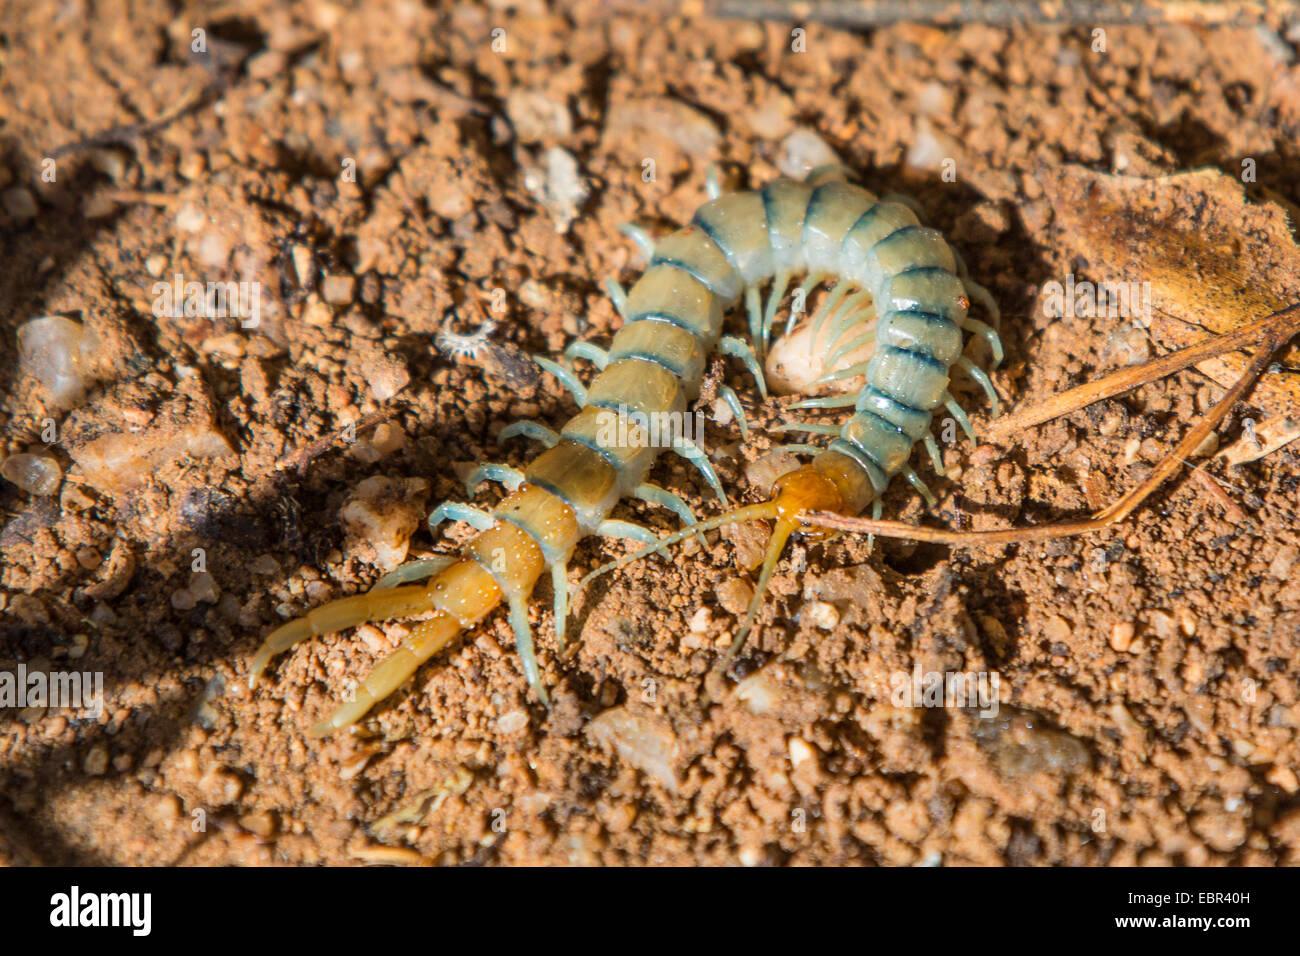 centipedes, chilopodians (Scolopendra heros arizonensis), on the ground, USA, Arizona, Phoenix Stock Photo